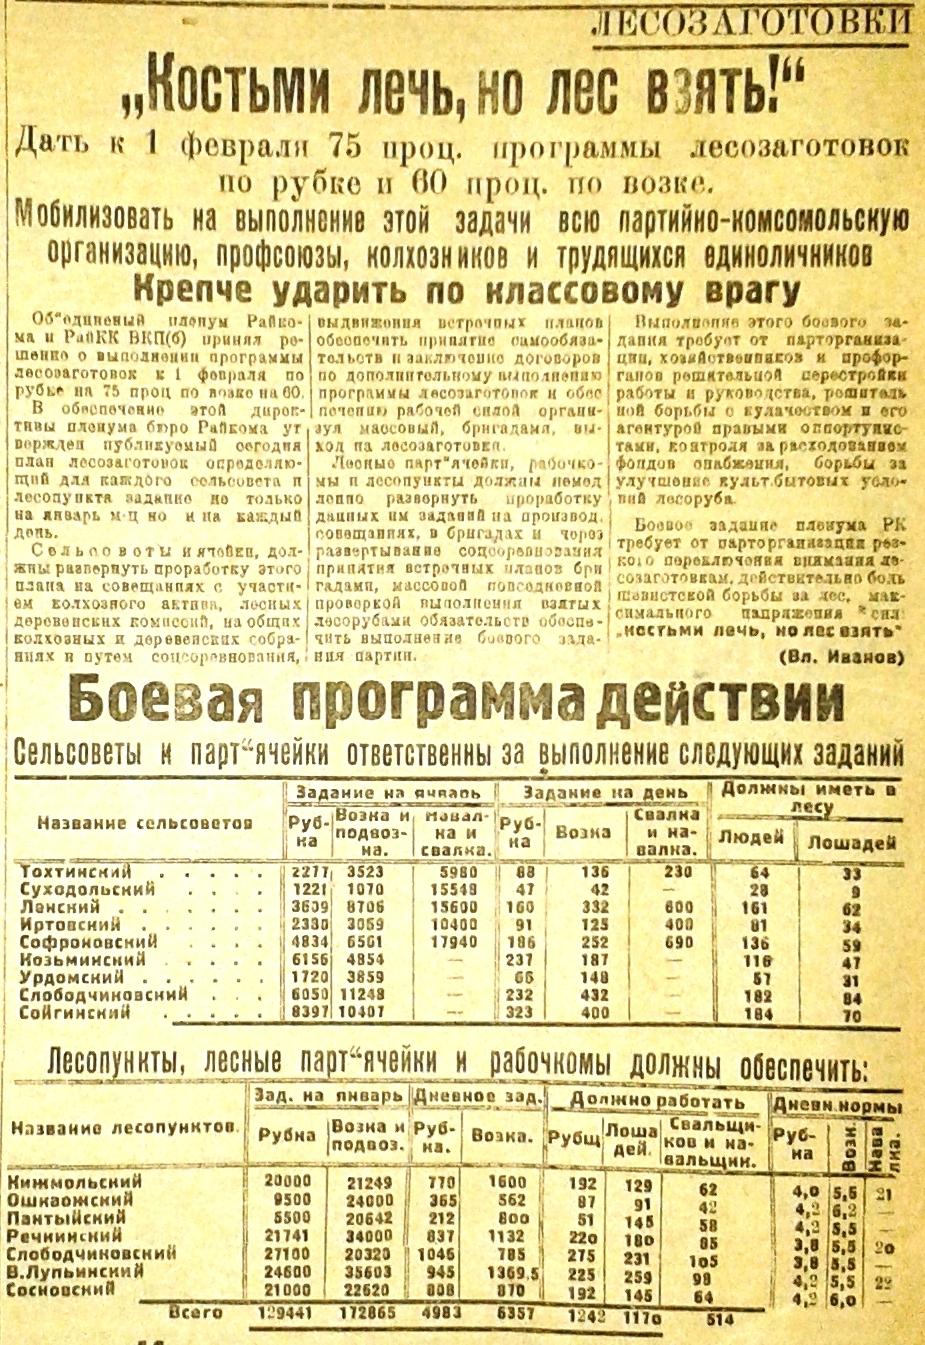 ЛК №2 от 06.01.33, Верхне-Лупьиснкий лесопункт